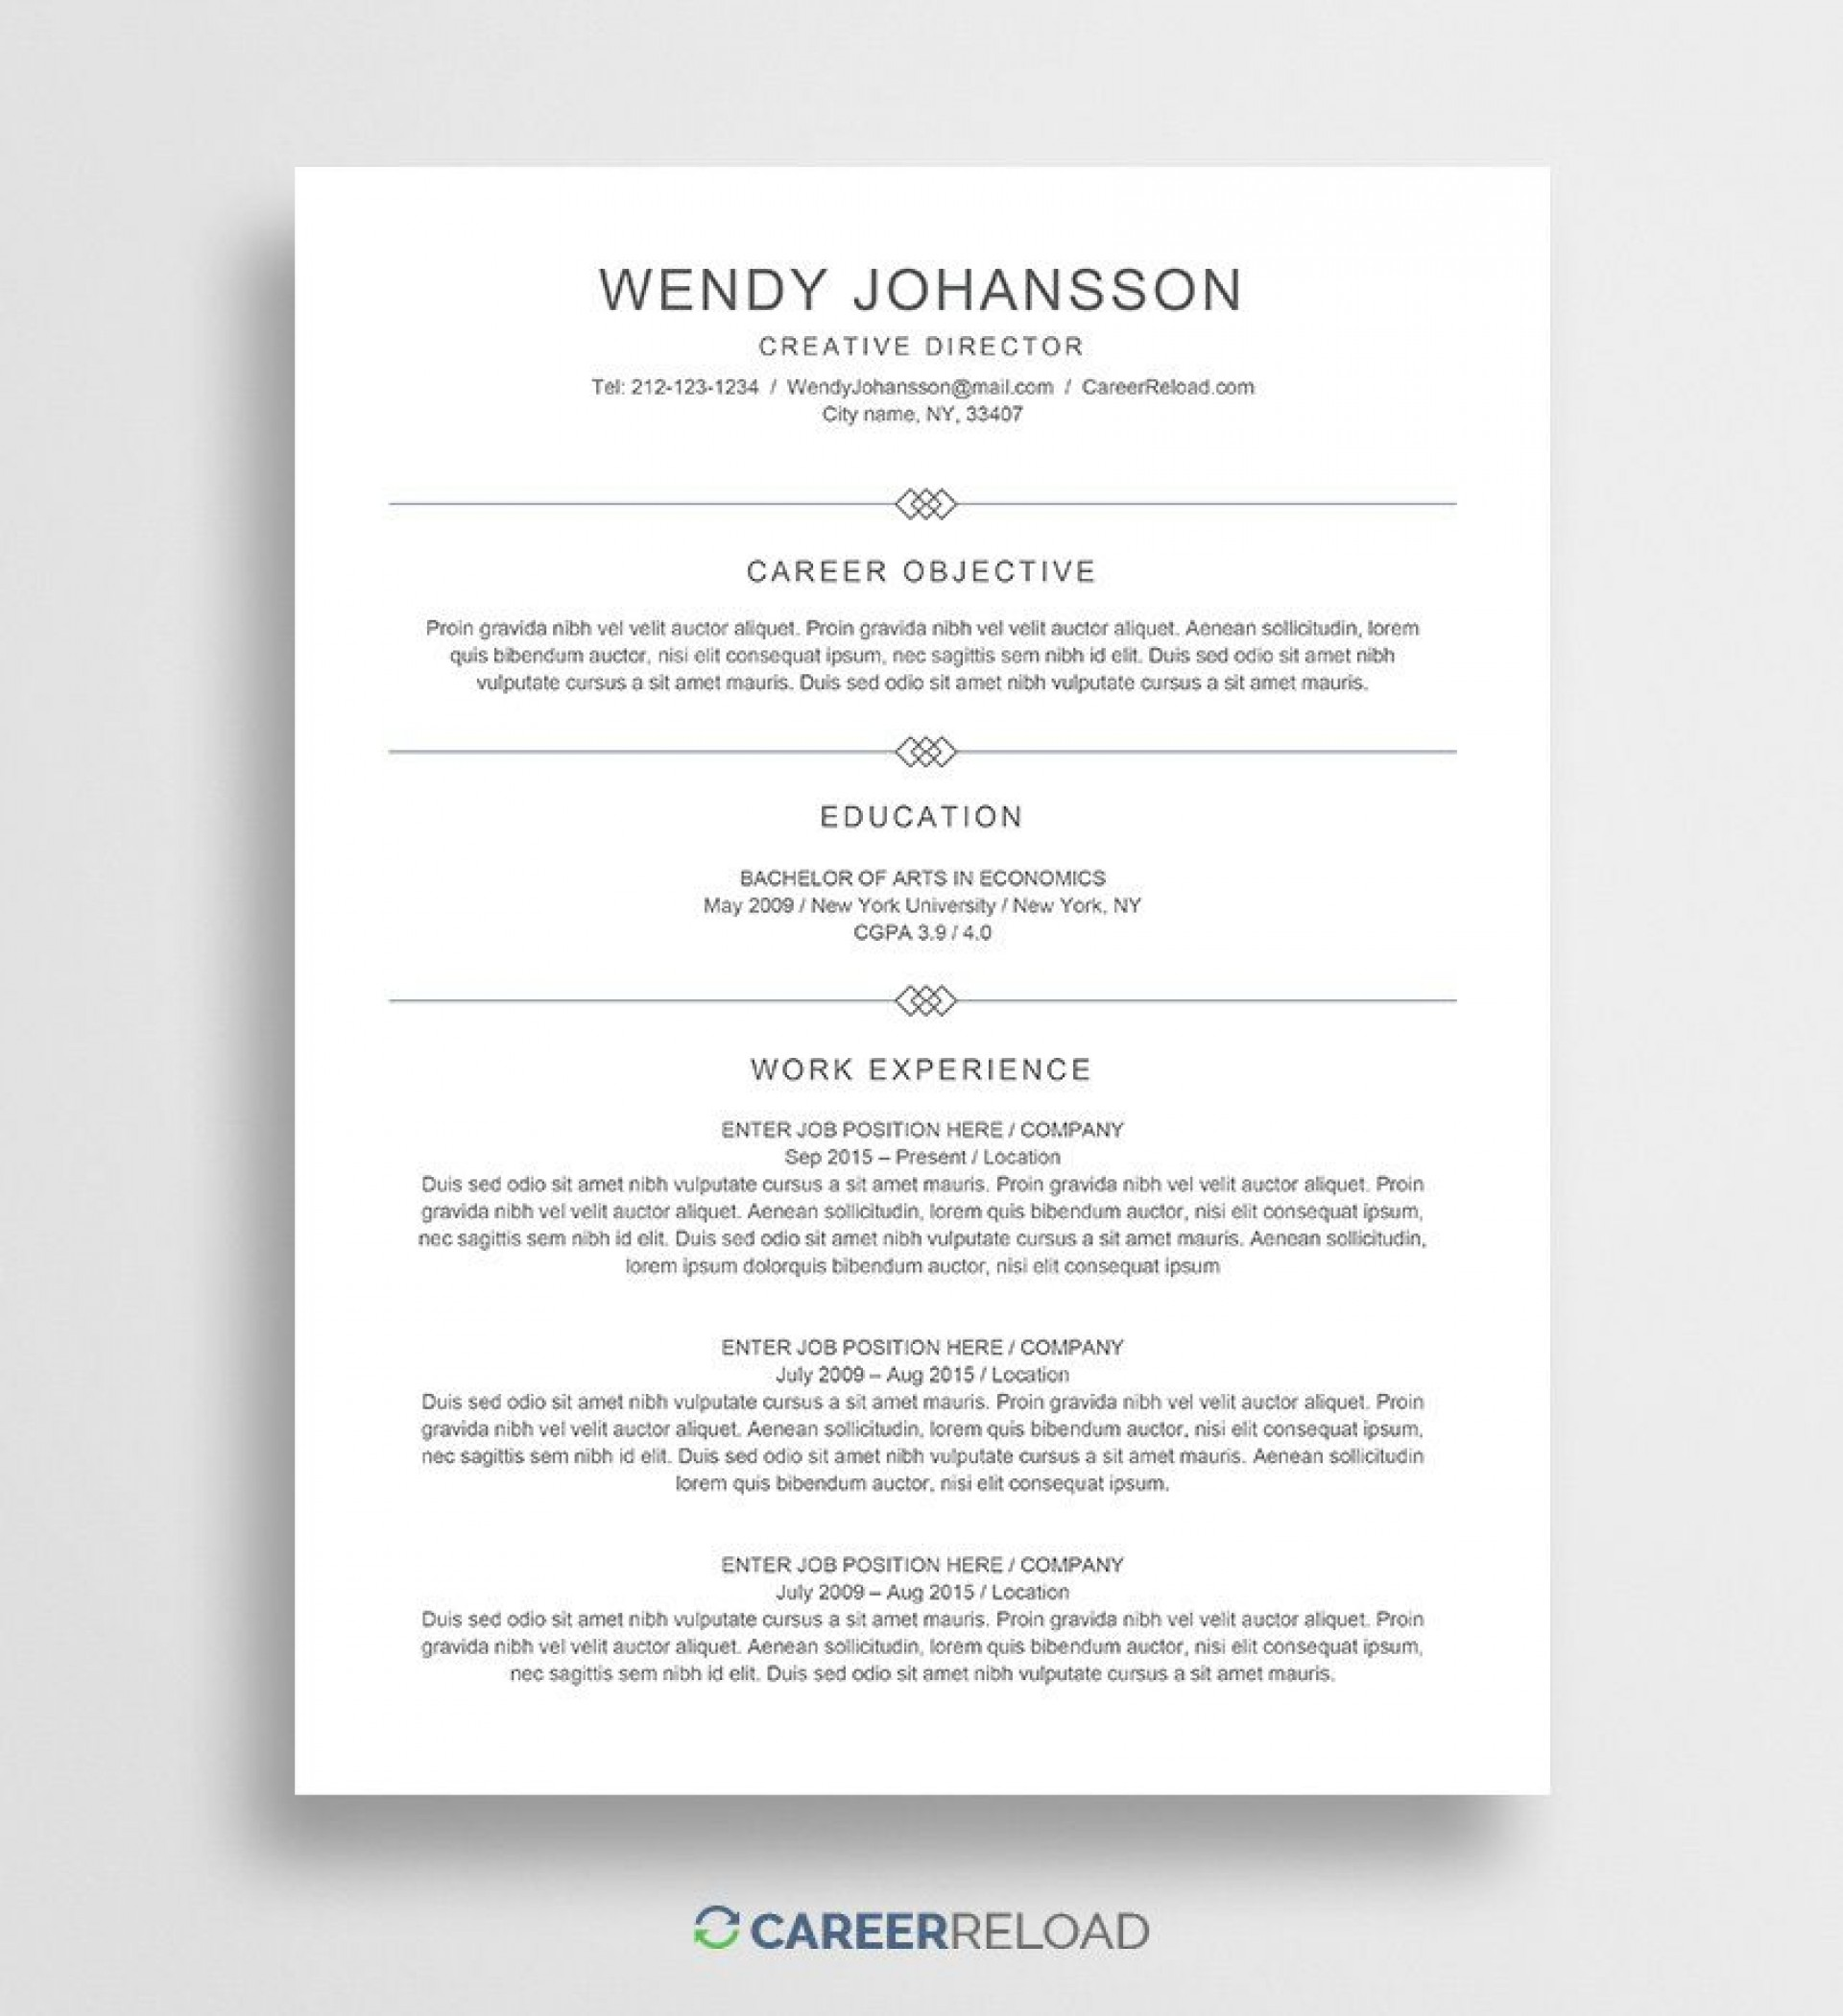 006 Imposing Free Professional Resume Template Microsoft Word Image  Cv 20101920